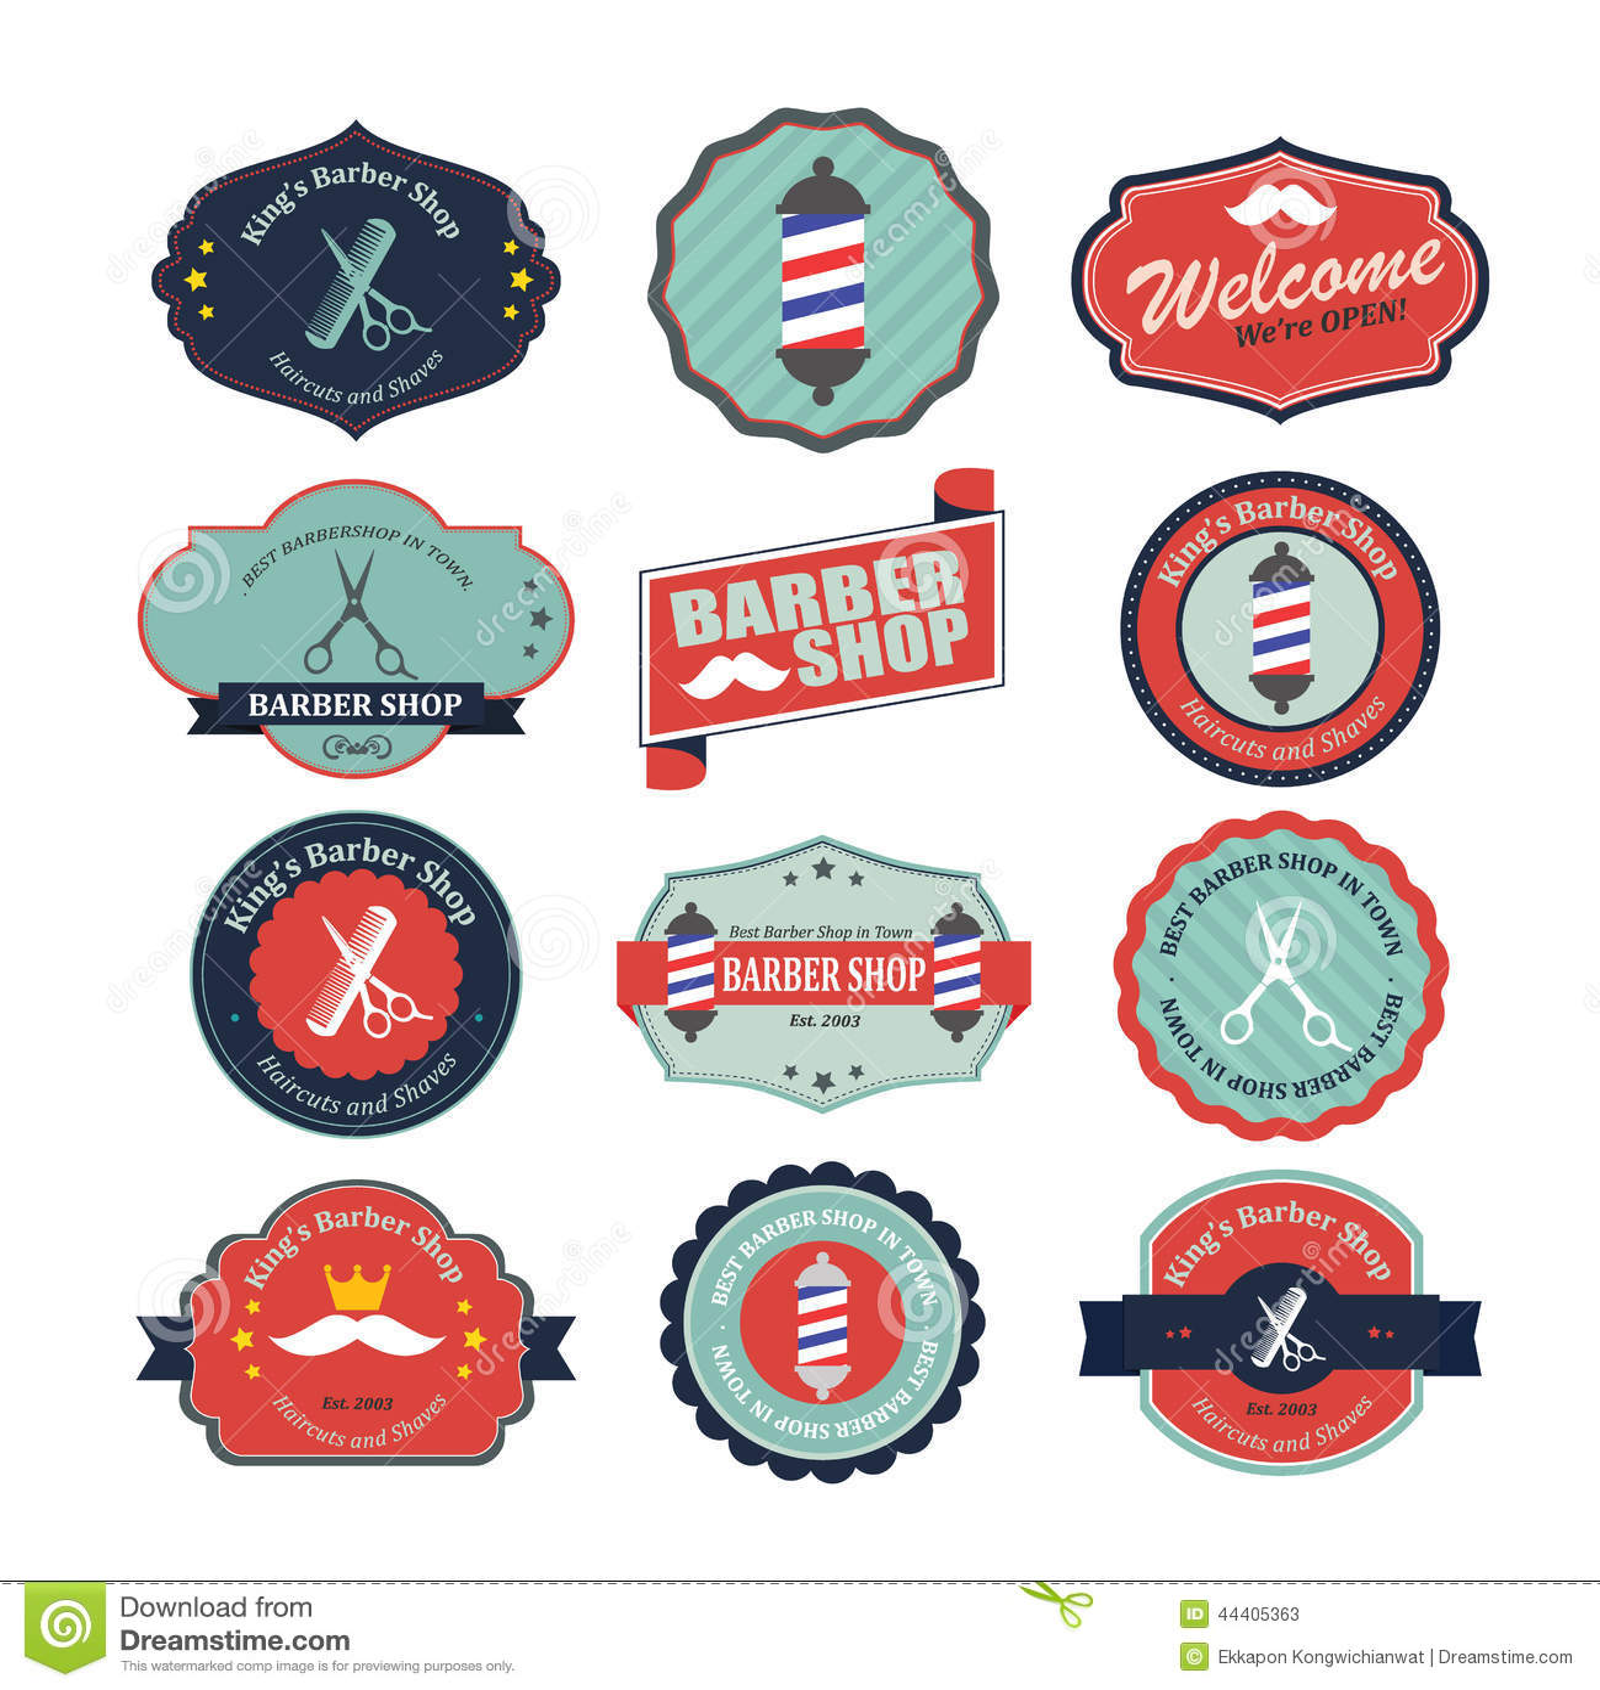 Clip art vector of vintage barber shop logo graphics and icon vector - Royalty Free Vector Barber Set Shop Vintage